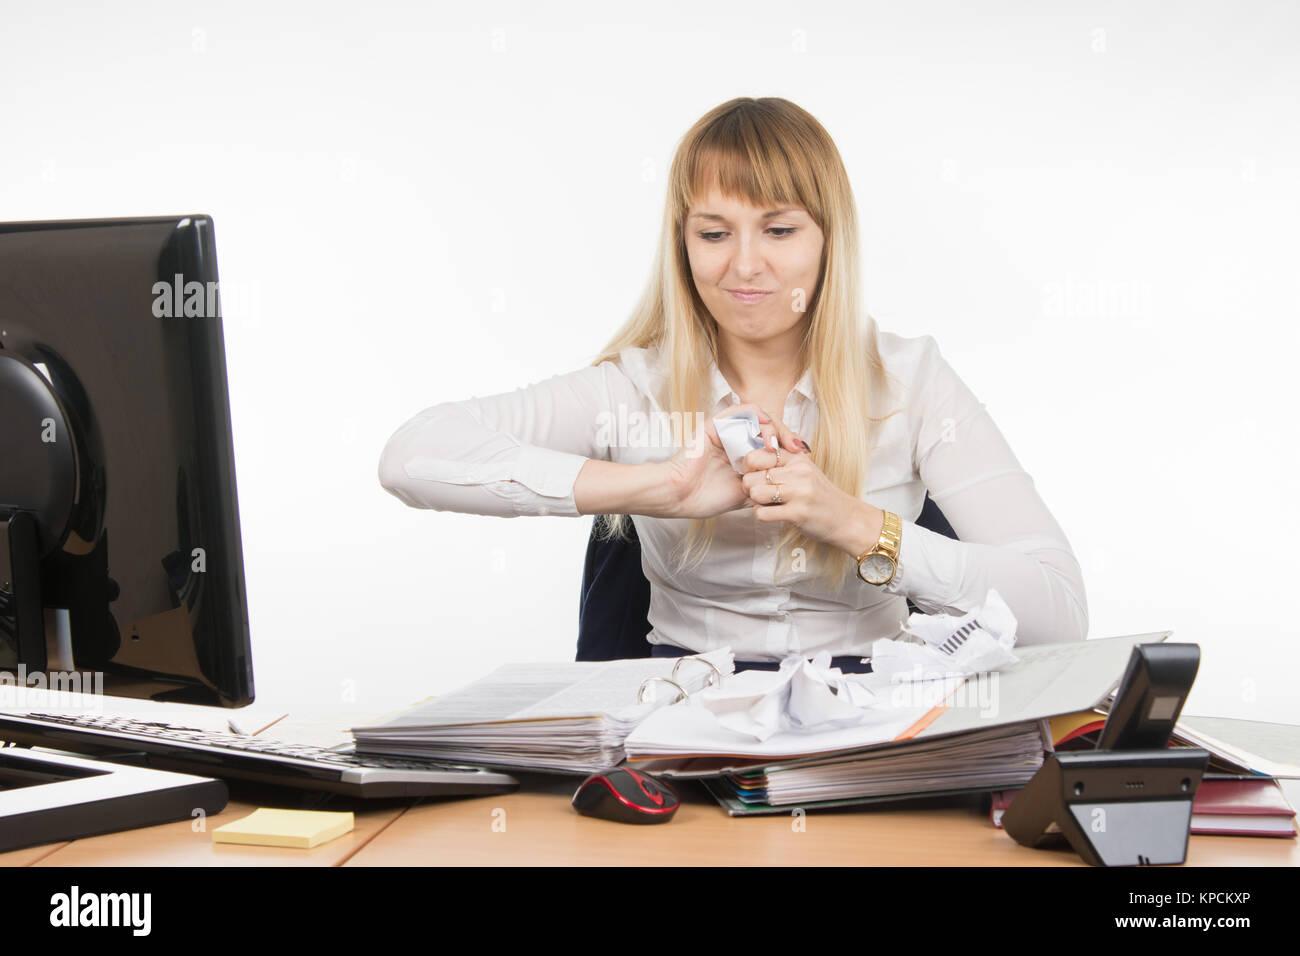 Business-Frau zermalmt gewaltsam ein anderes Dokument in Papierform Stockbild